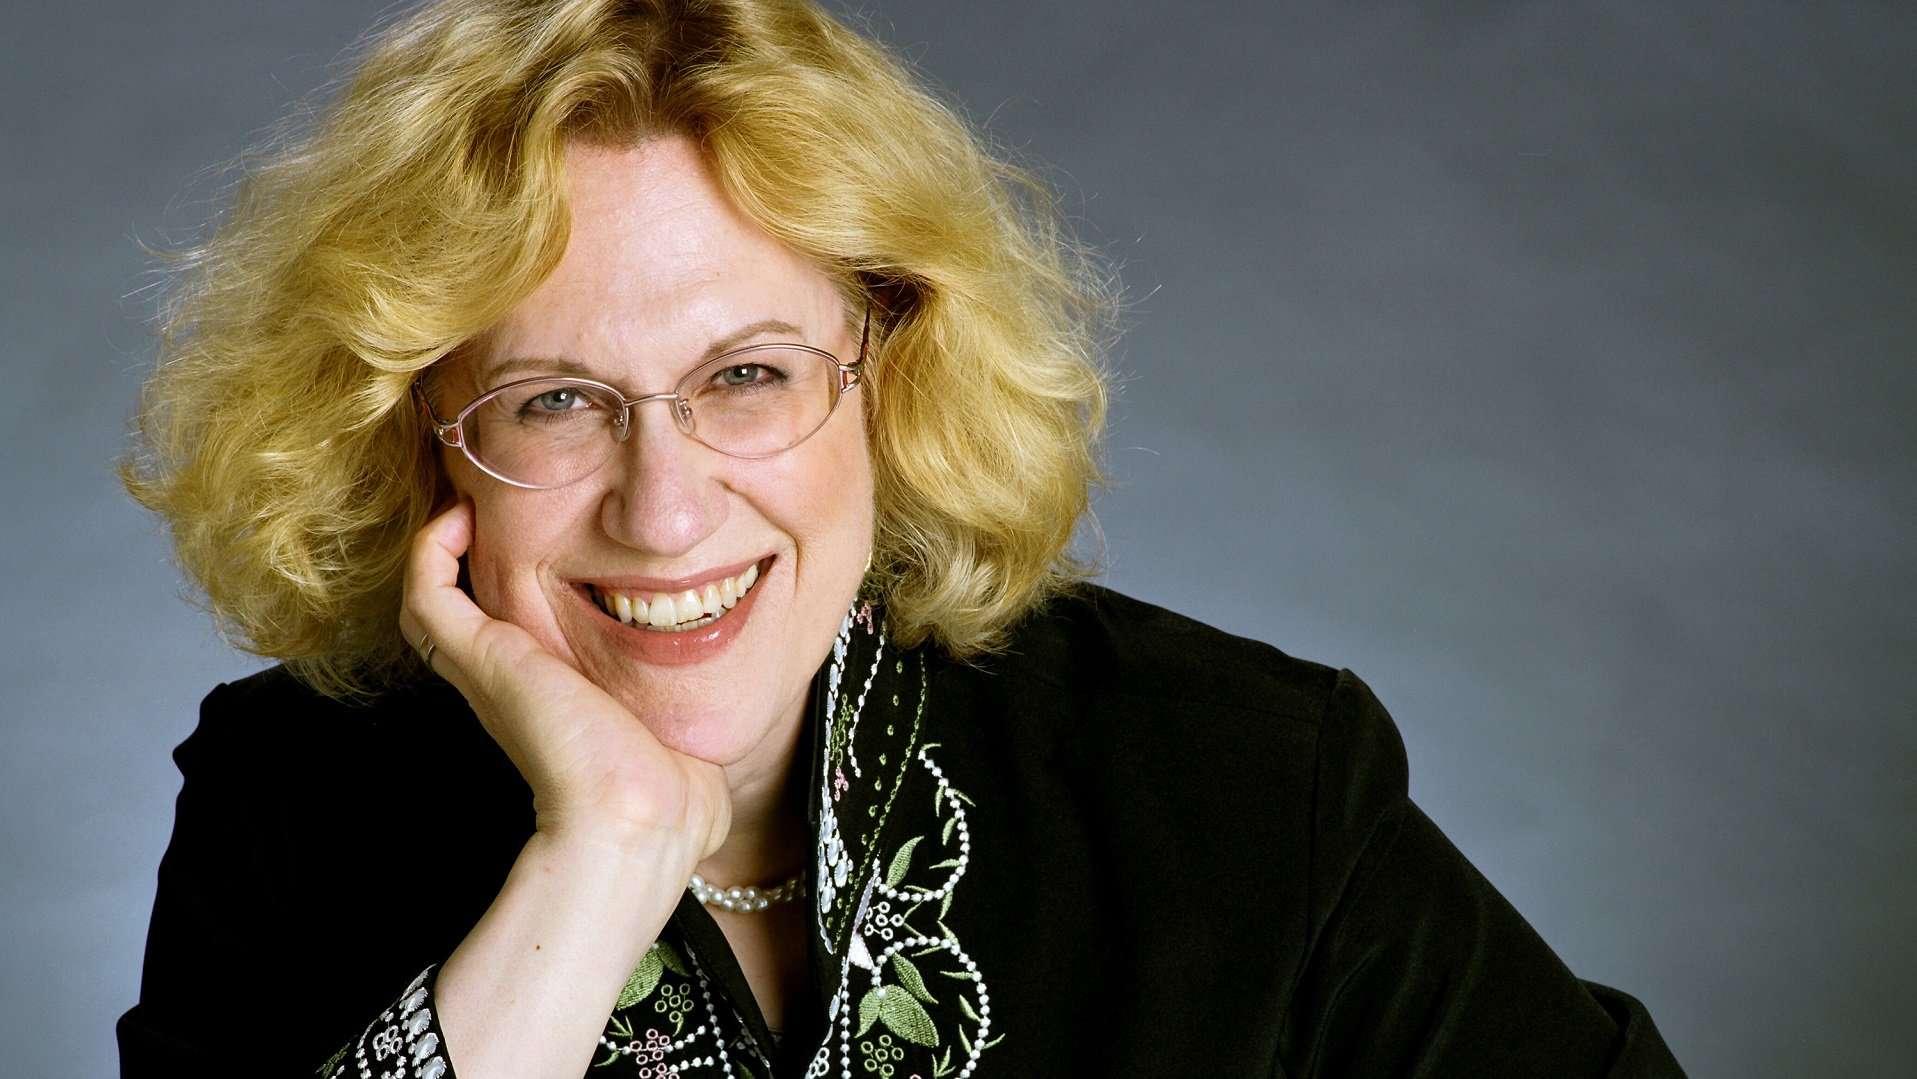 Sara D. Buechner, piano